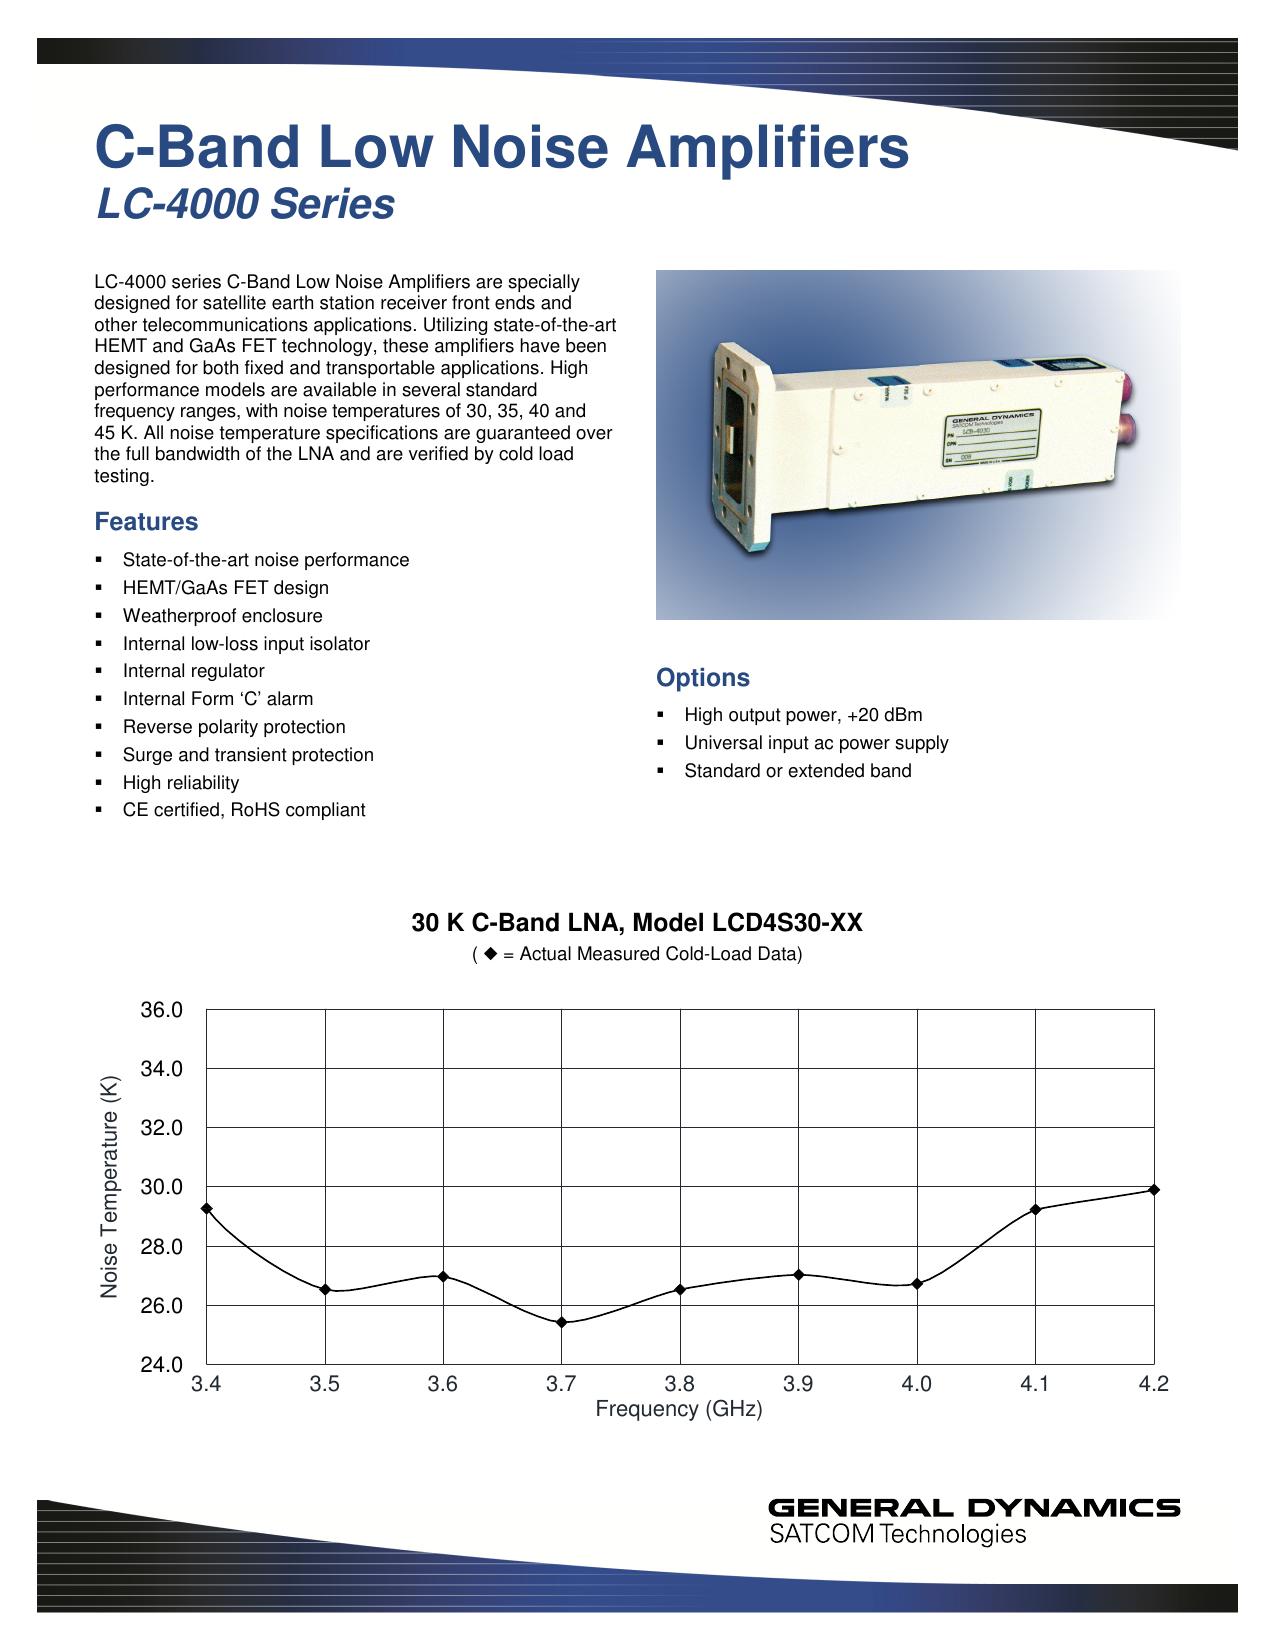 C-Band Low Noise Amplifiers - General Dynamics SATCOM